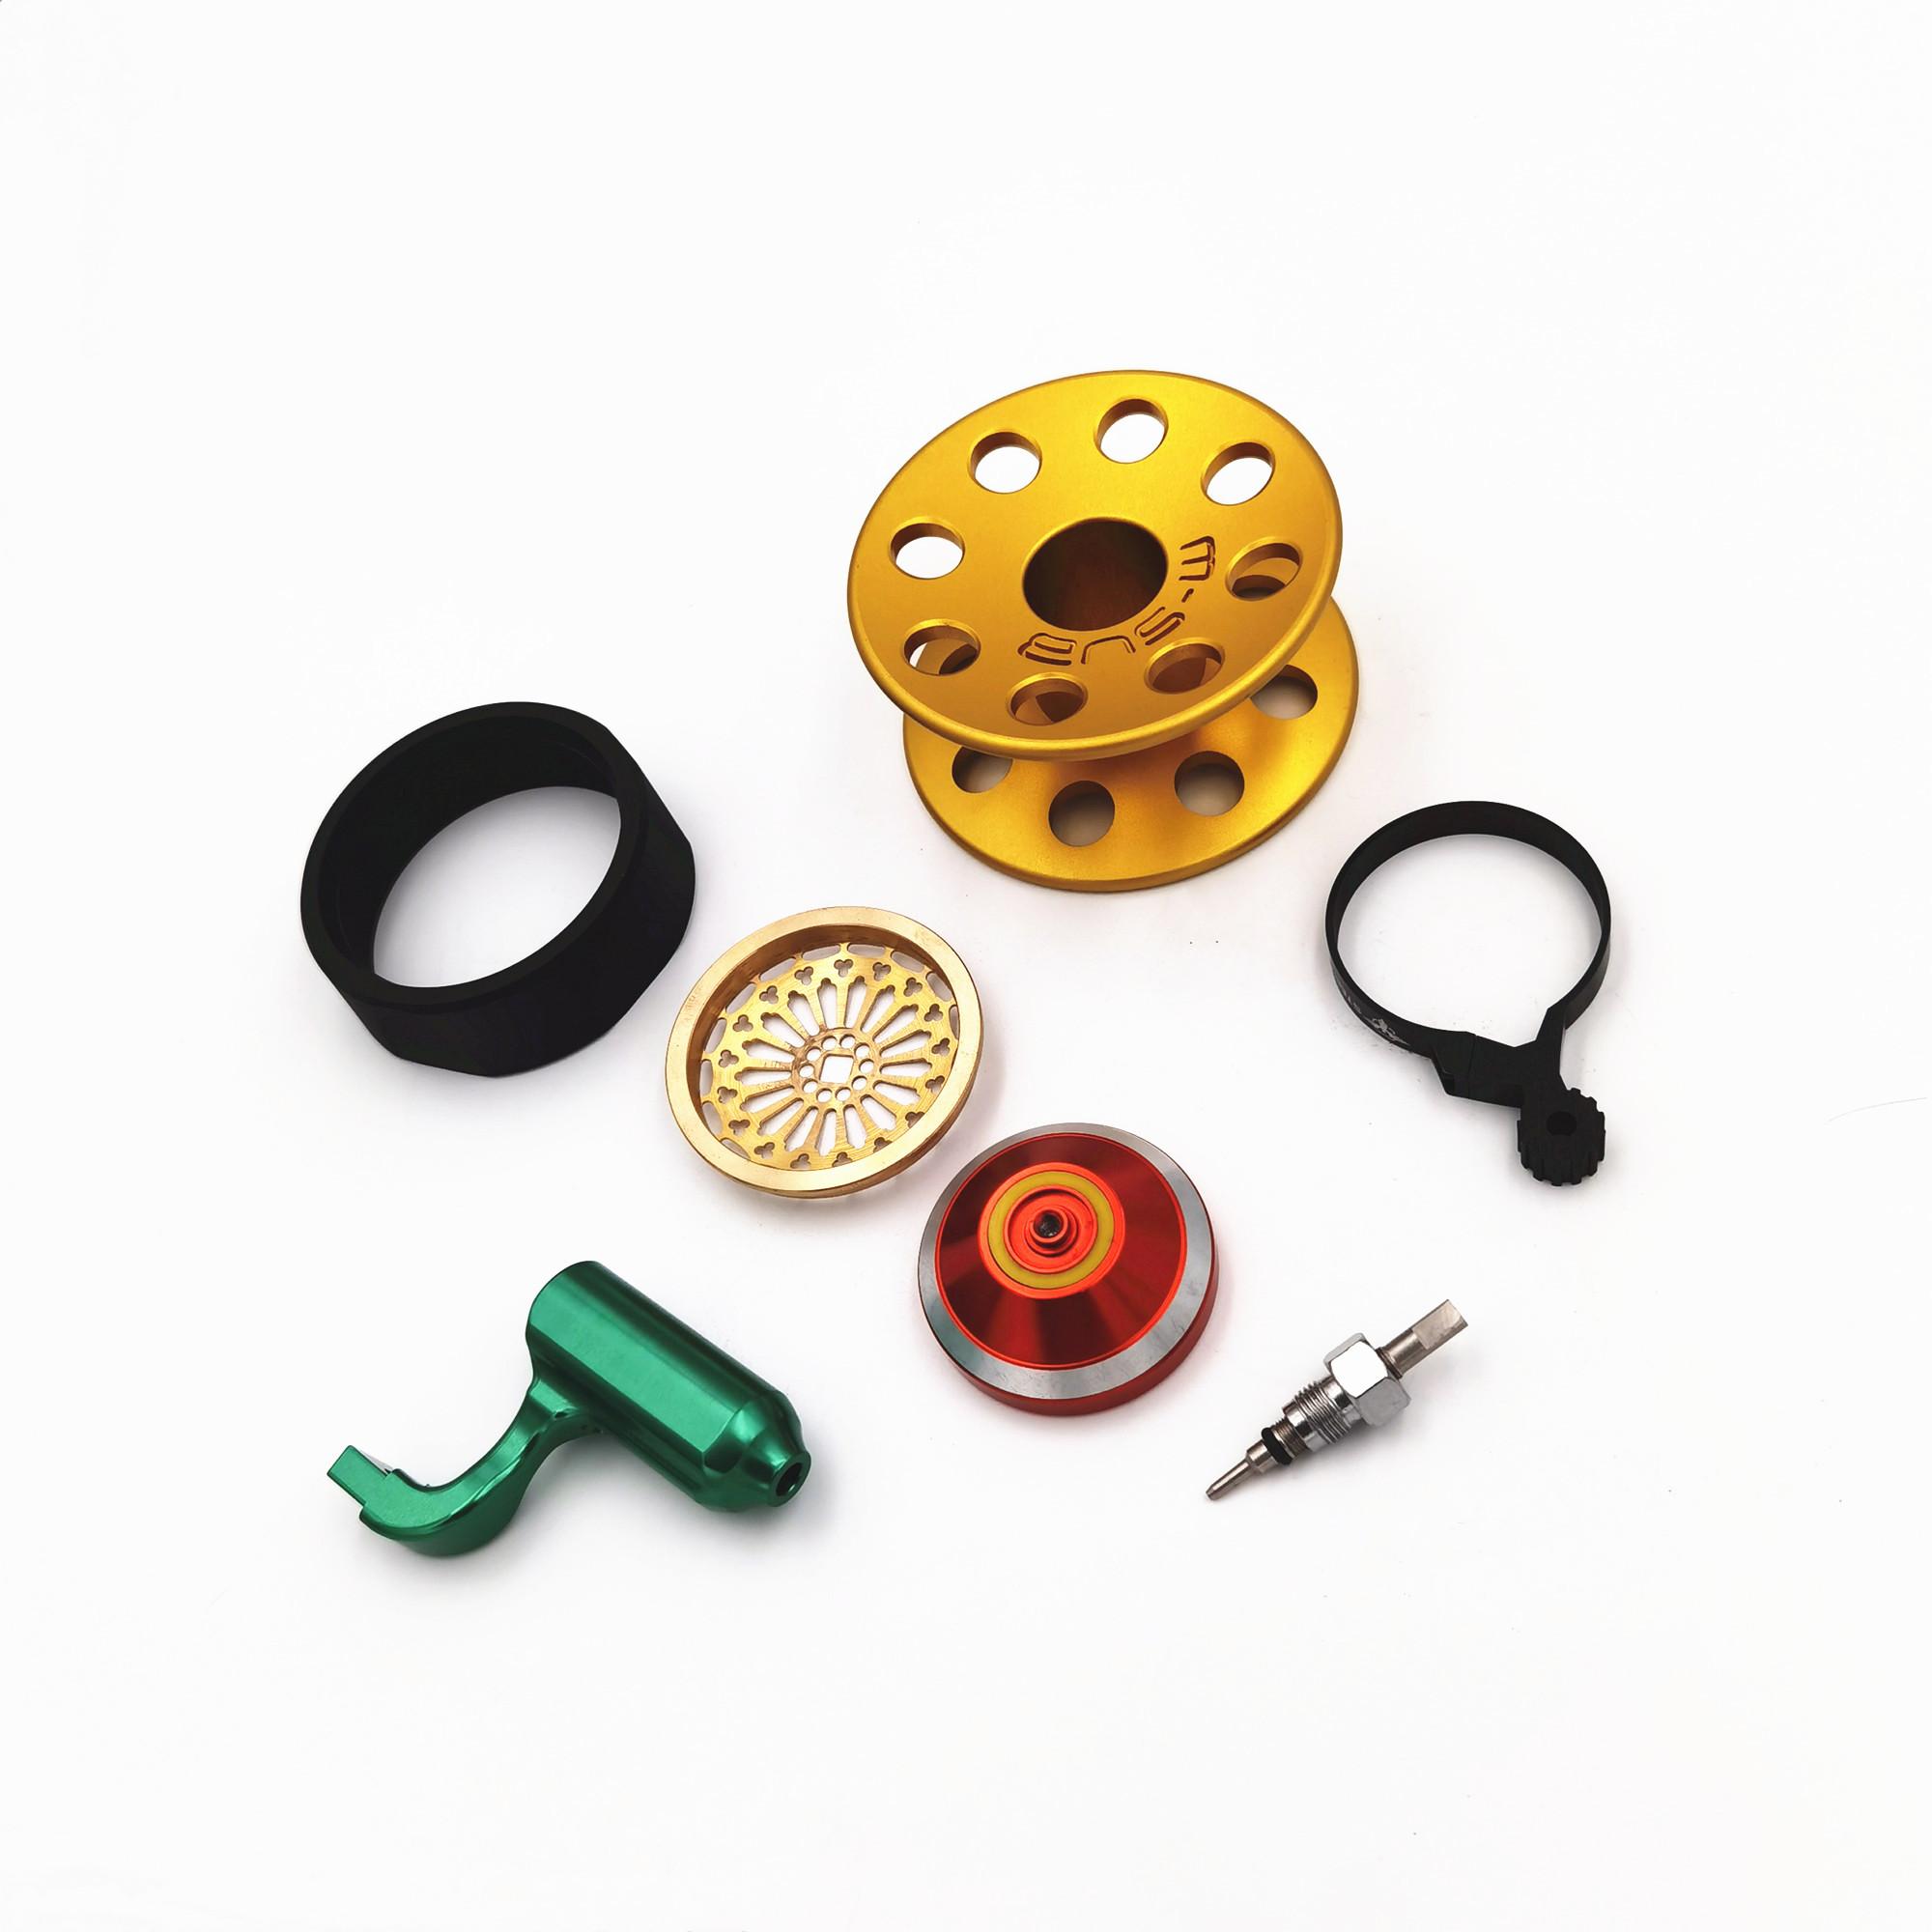 Yaopeng Metal Products Co., Ltd Main Image